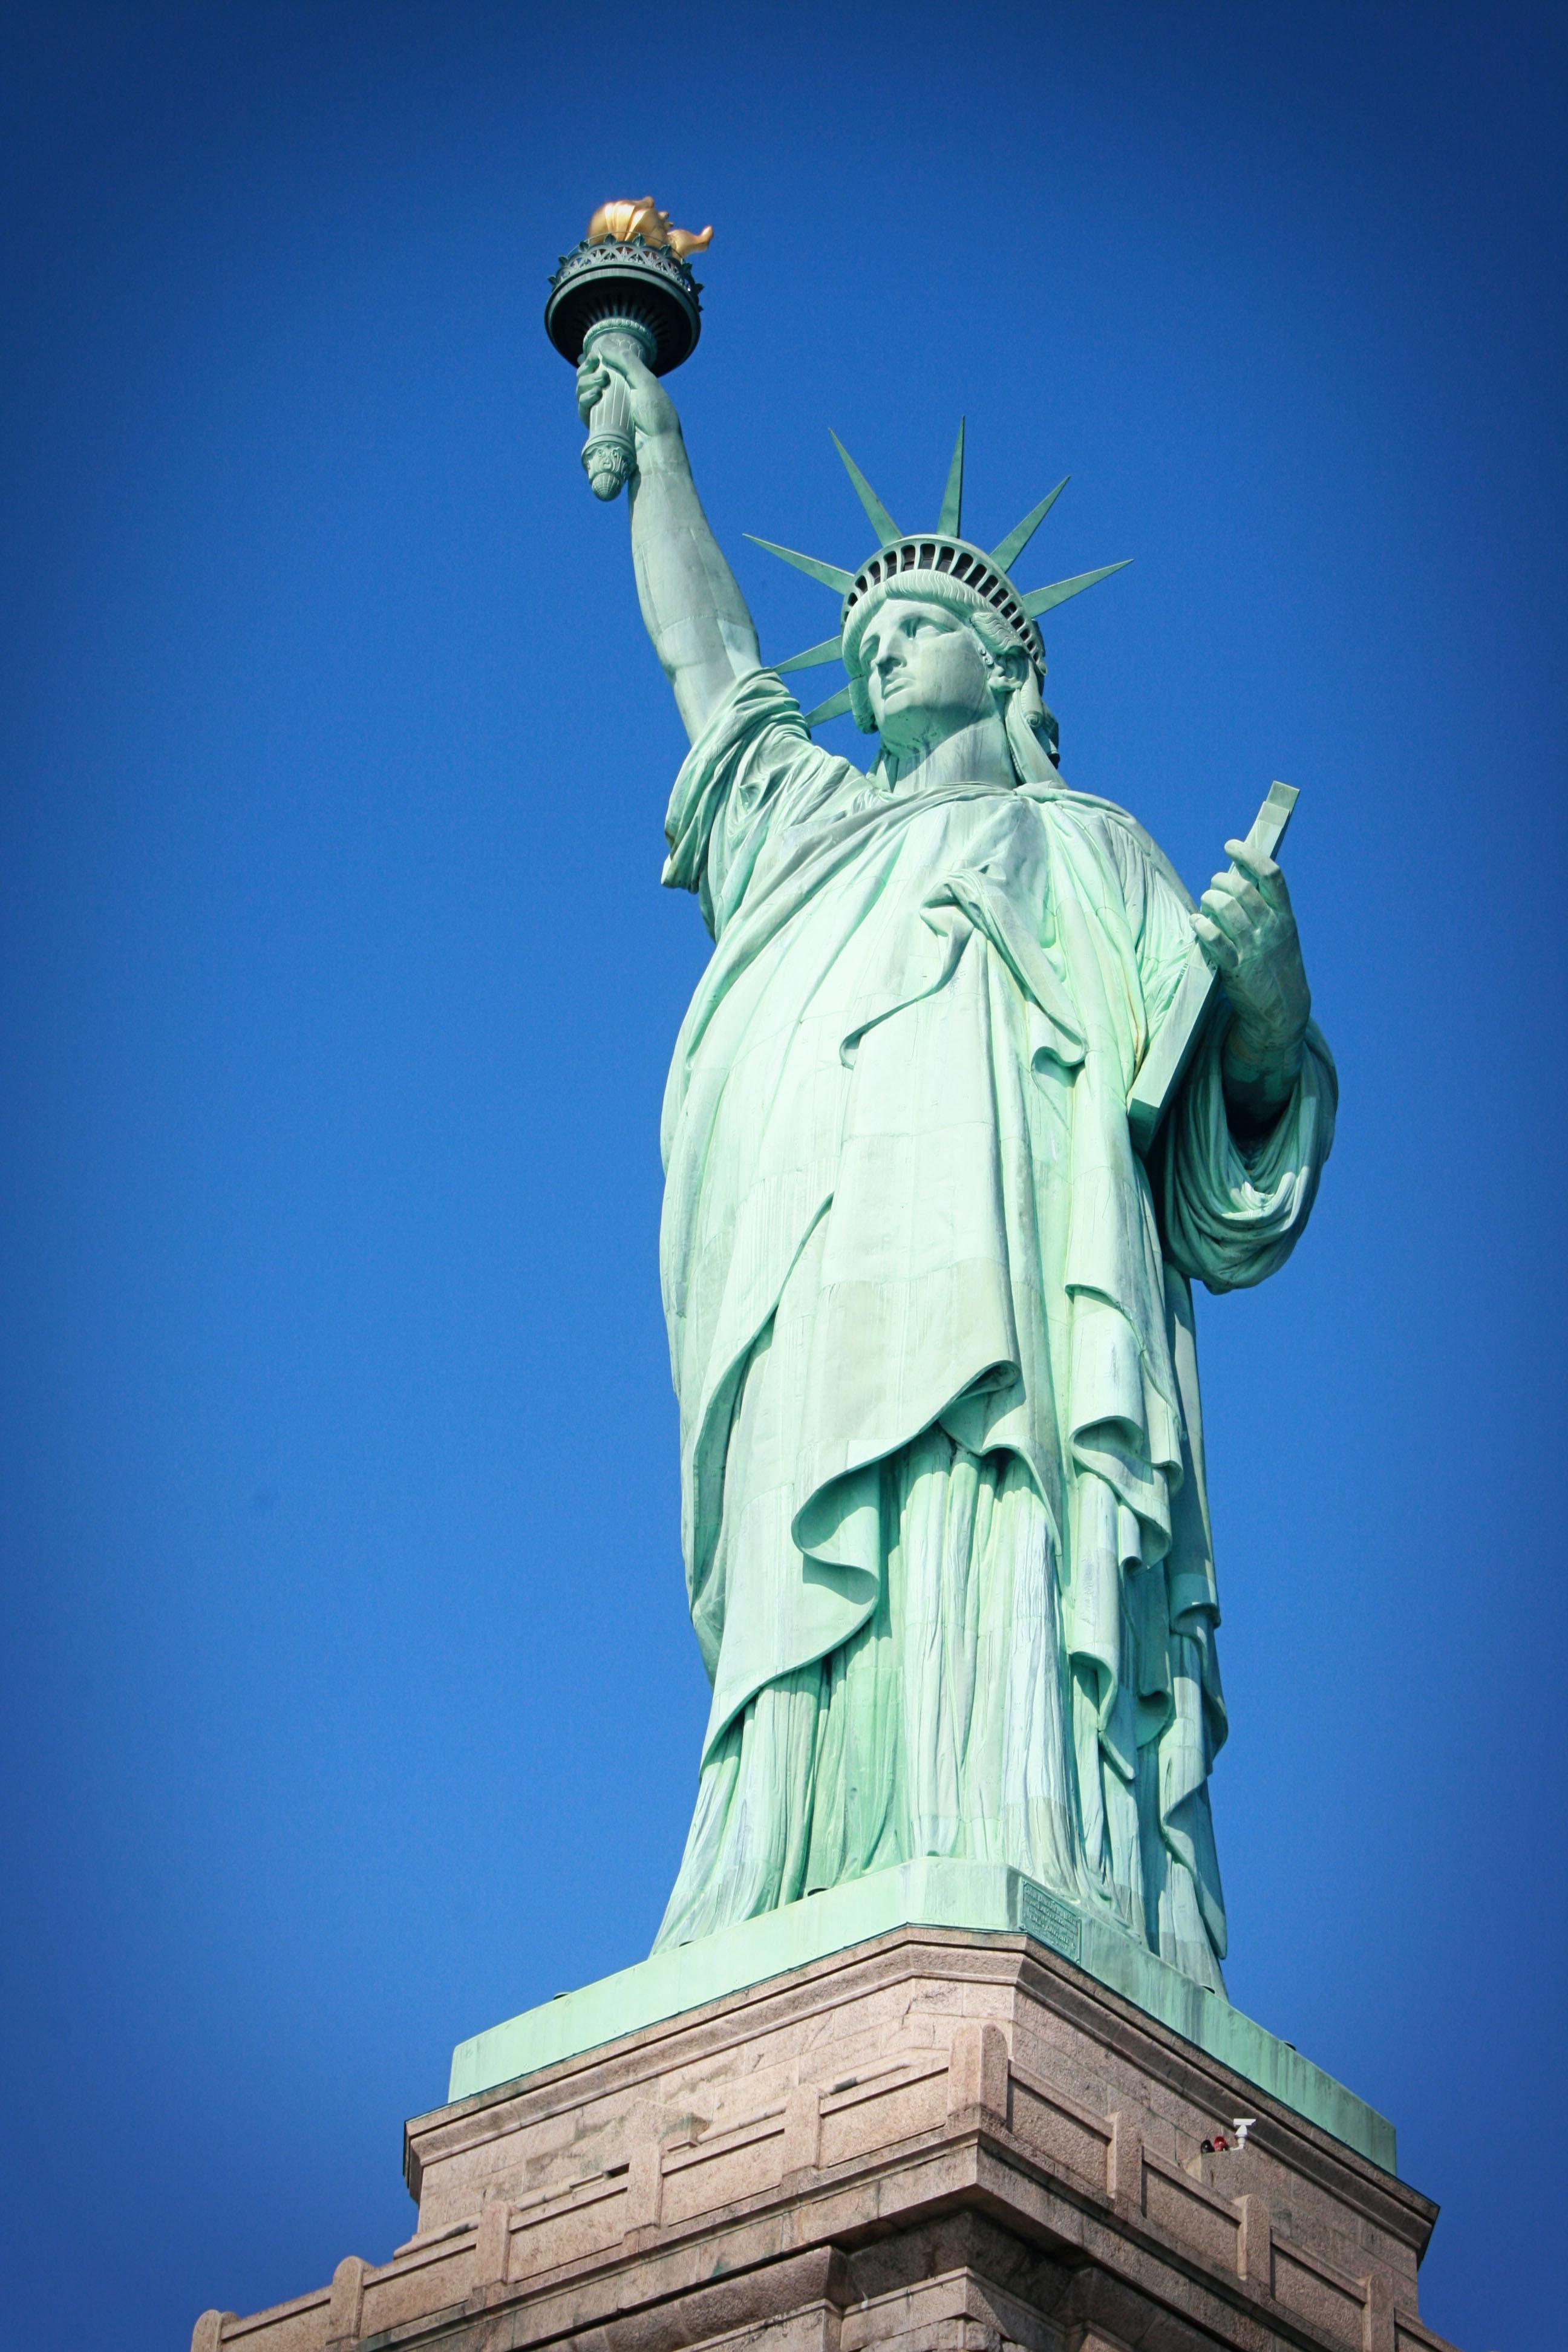 god bless america, my home sweet home | hum a tune